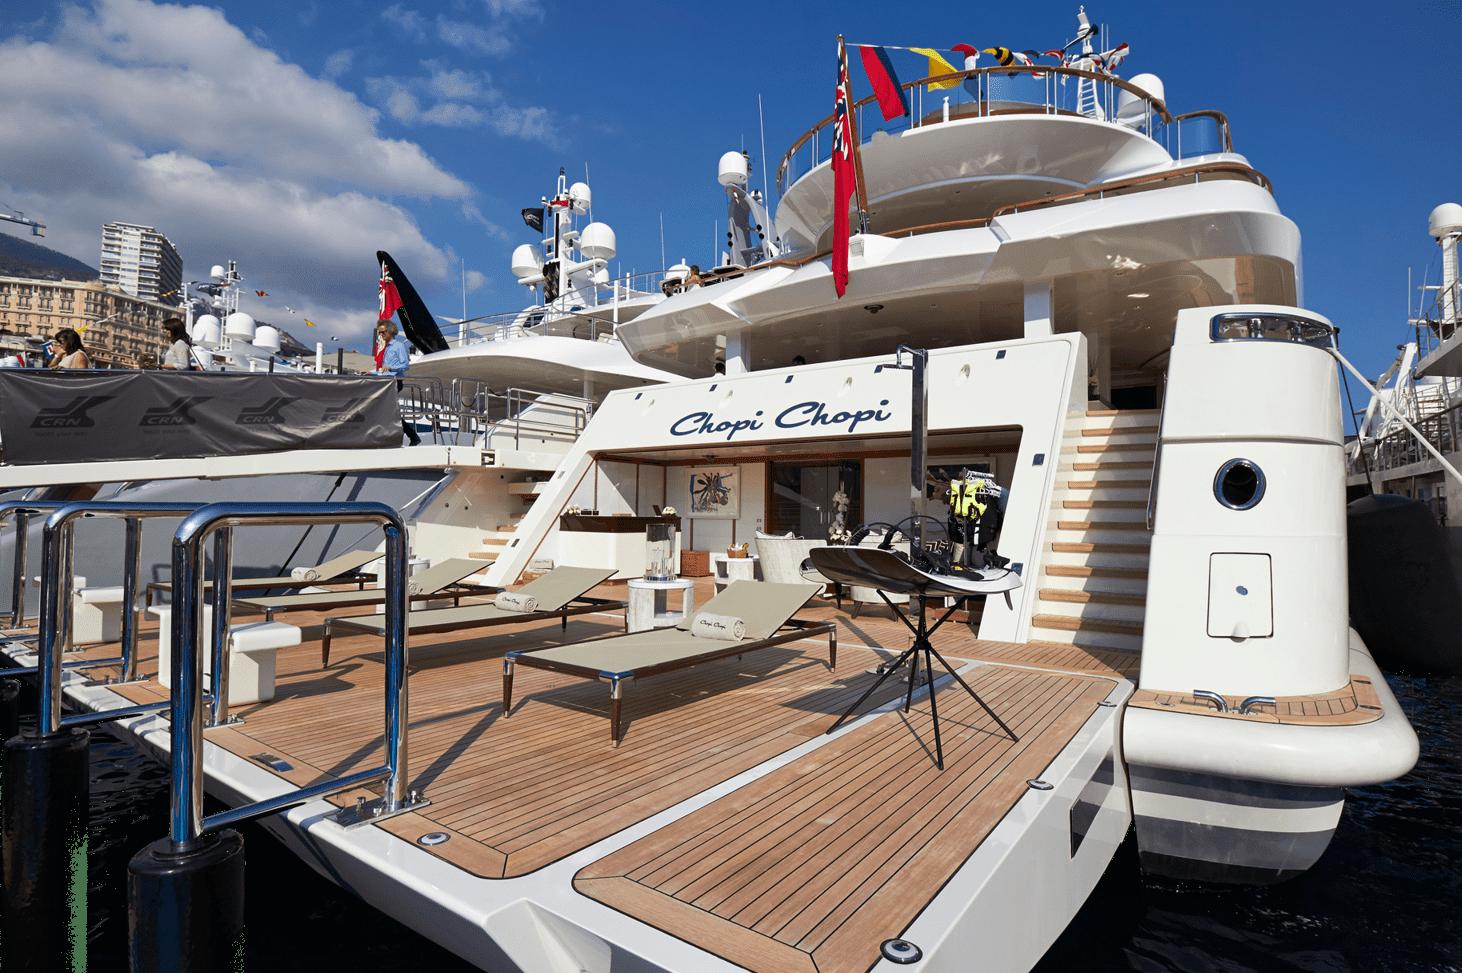 mega yacht rear boat show rev1 1492x973 min